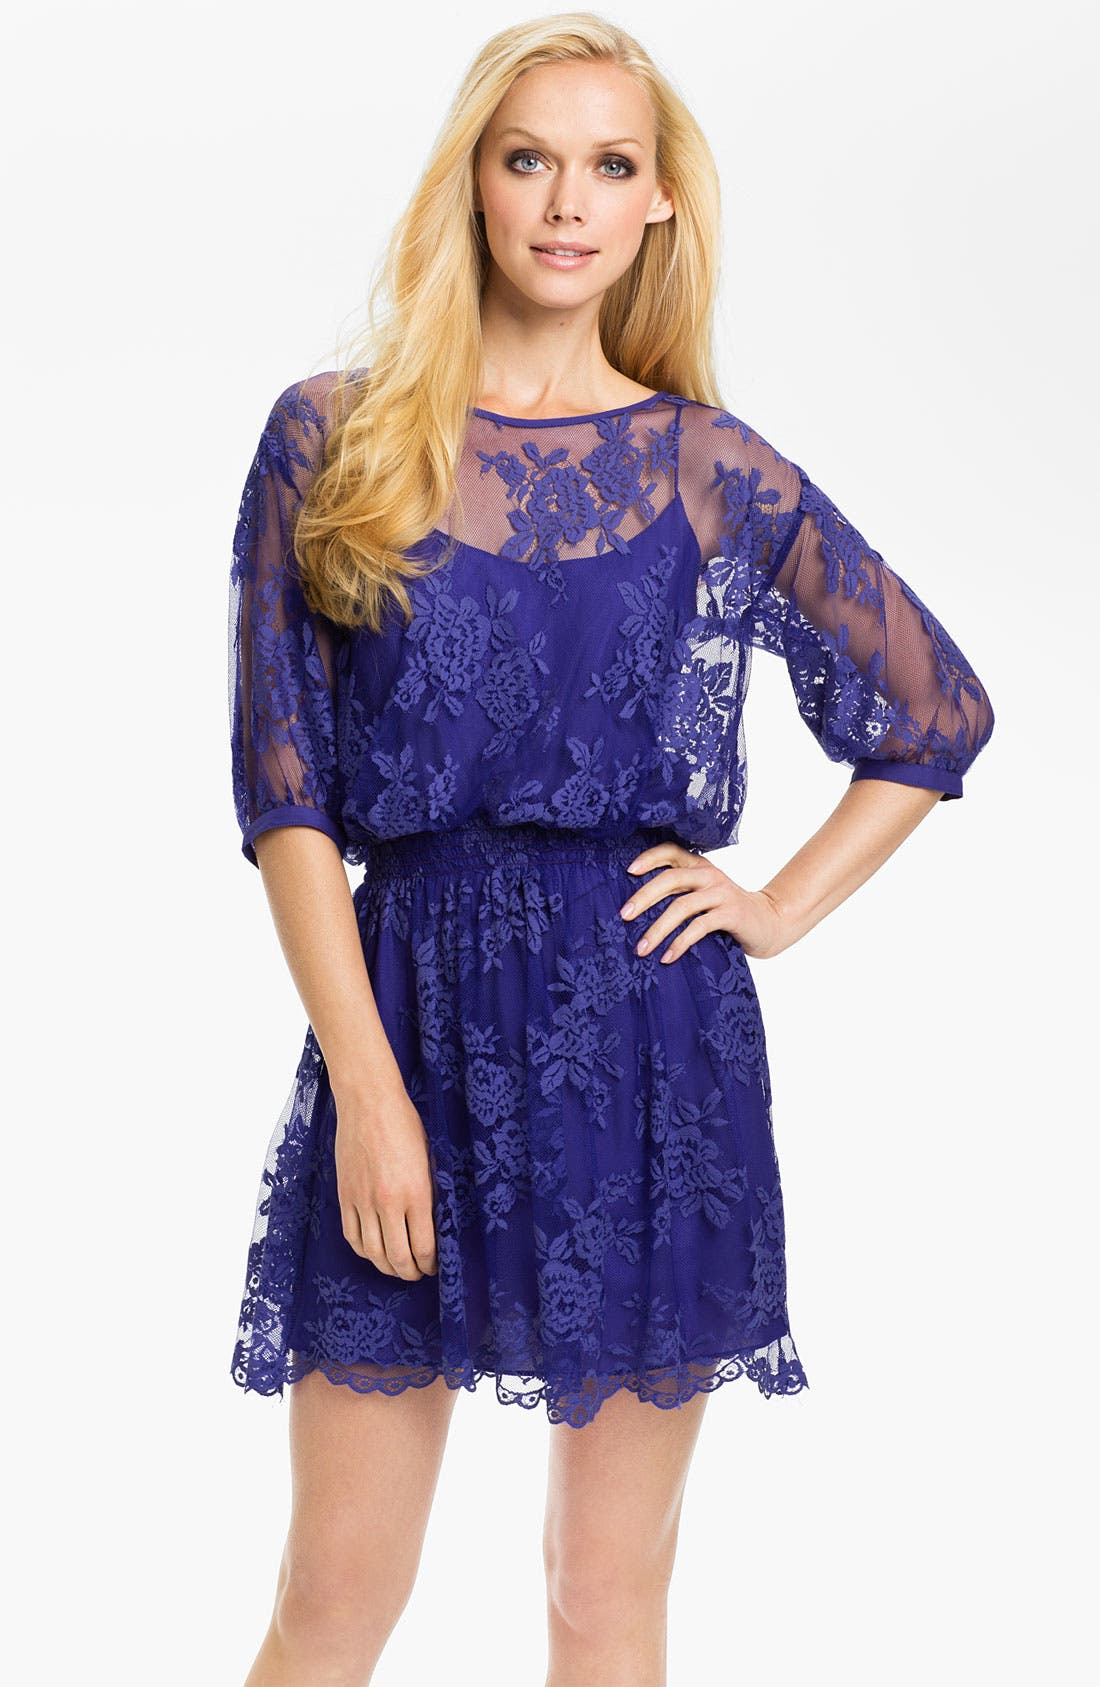 Alternate Image 1 Selected - Nicole Miller Lace Overlay Blouson Dress